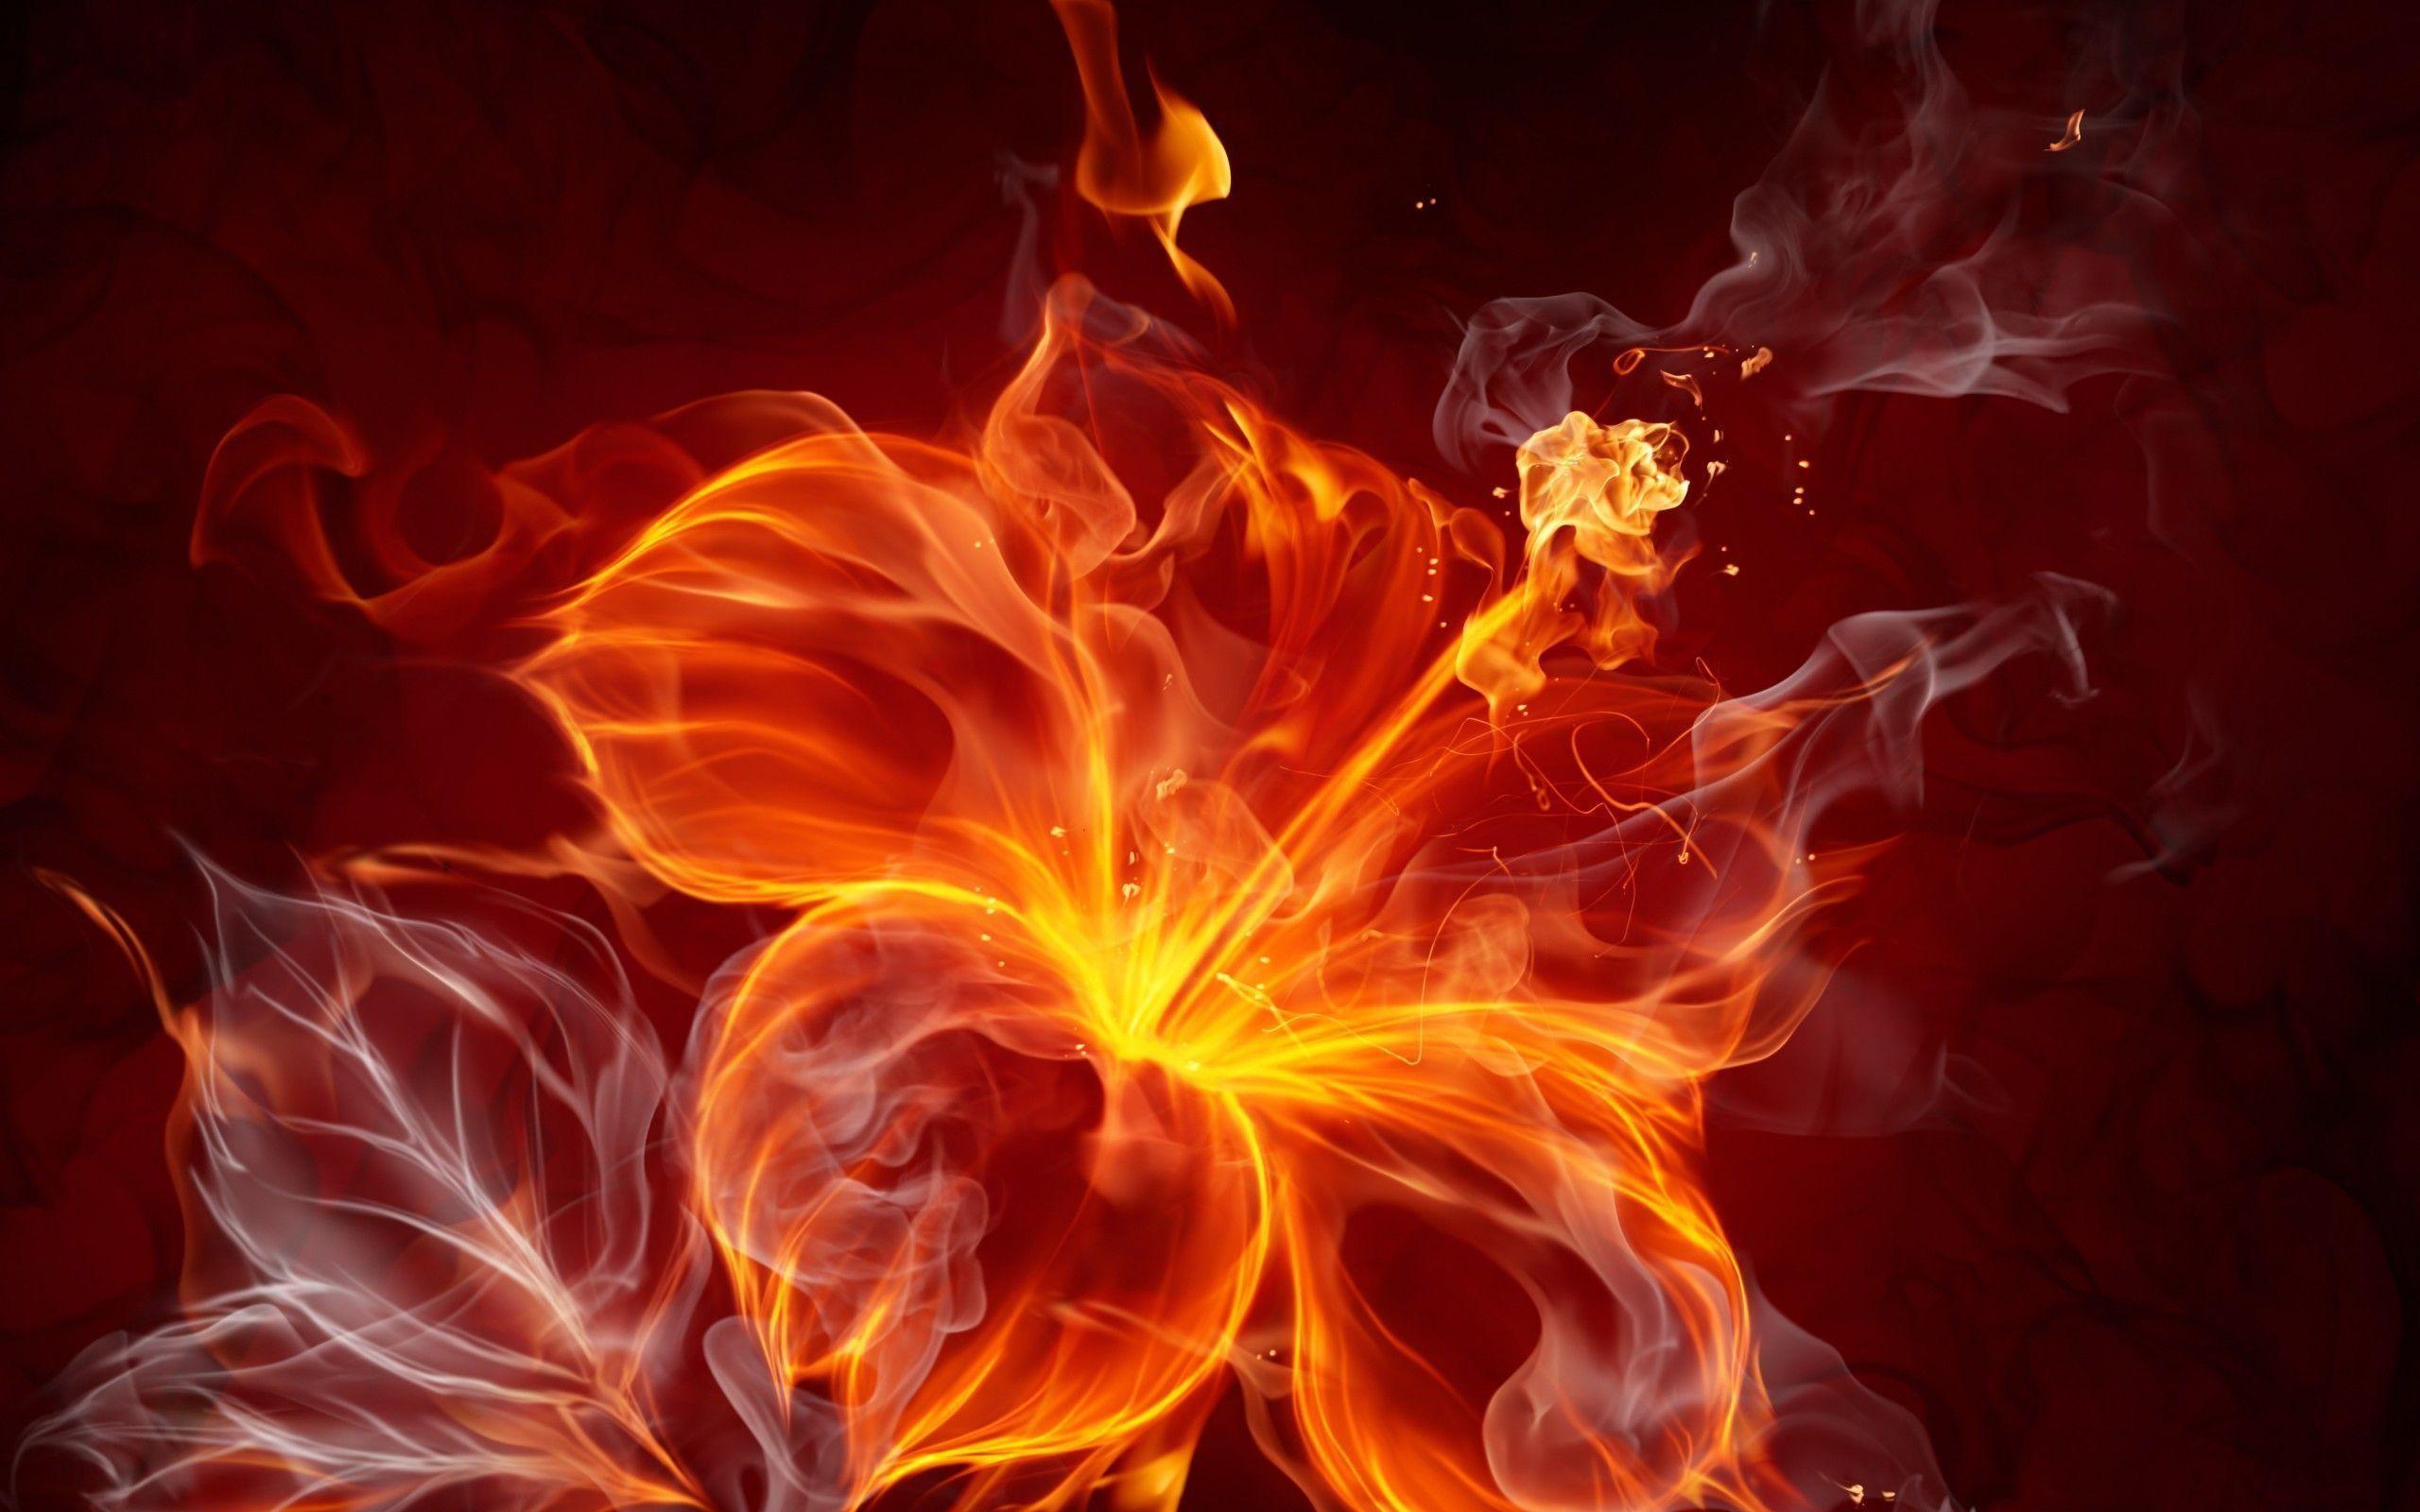 Blue Fire Flower Background Wallpaper Hd